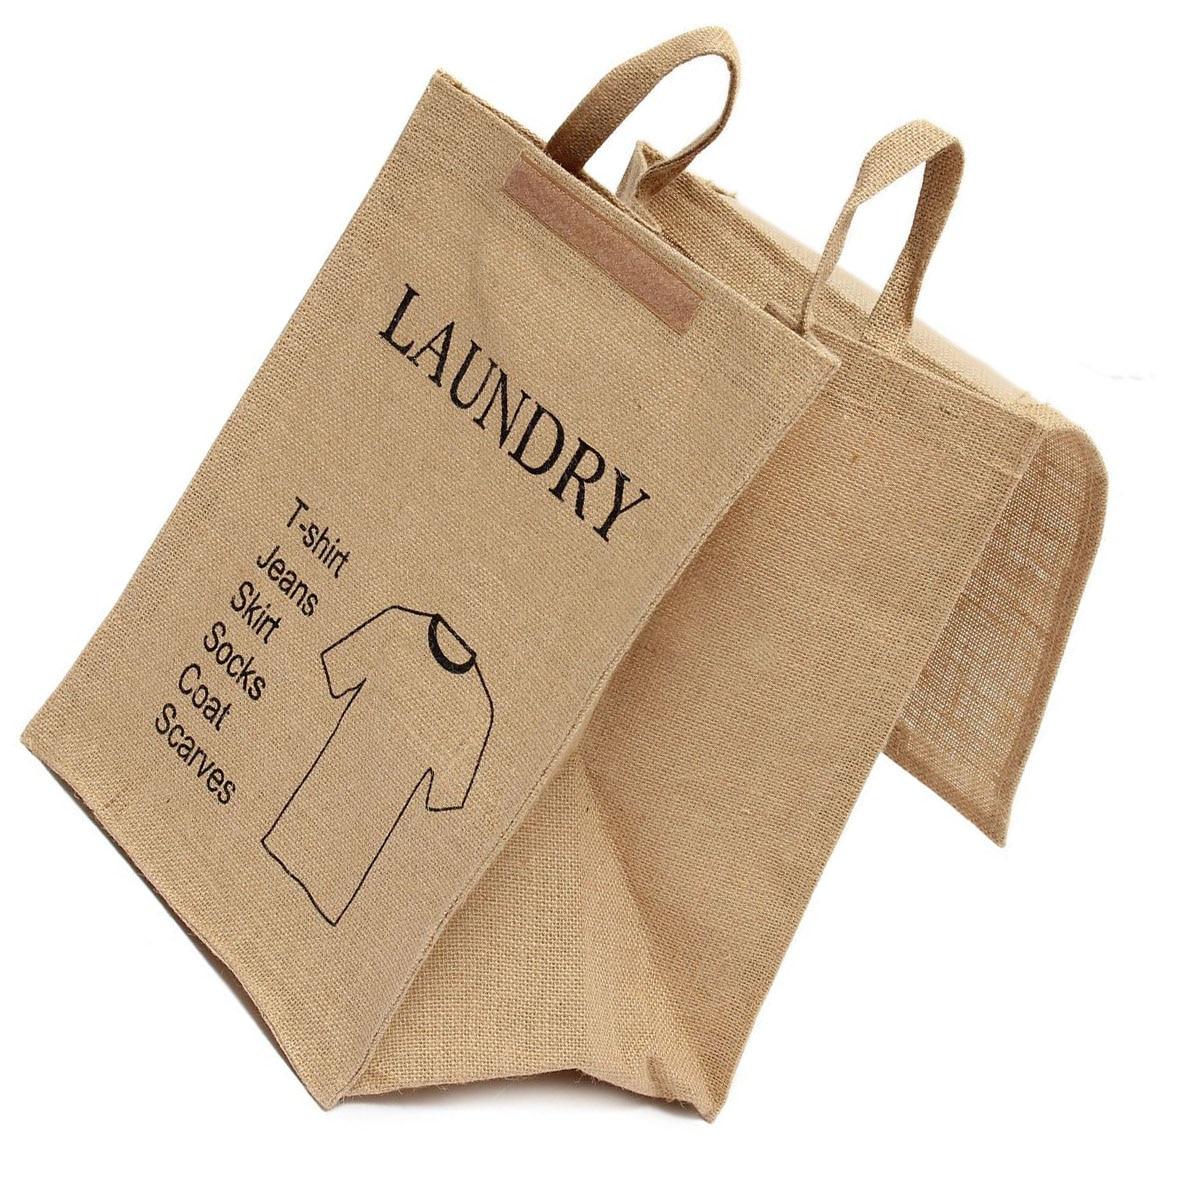 Large Cotton Linen Folding Laundry Washing Clothe Basket Bag Bin Storage Hamper(Man T-Shirt Pattern)